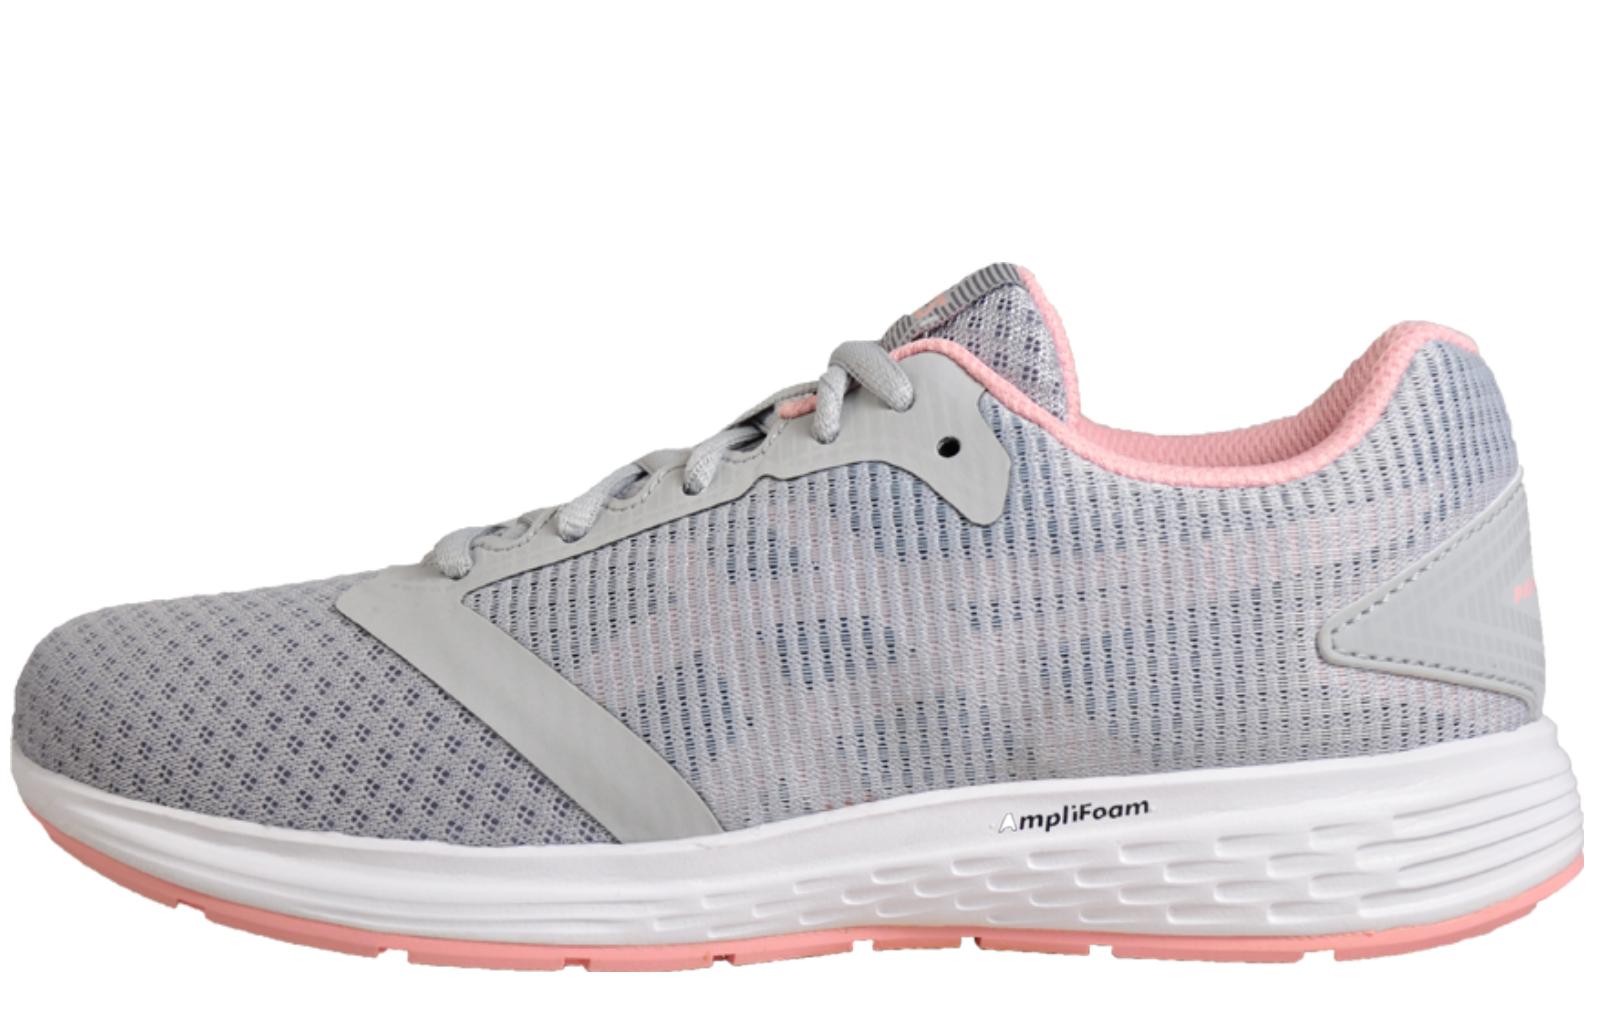 9ec30c7768f Cheap ASICS Trainers   Shoes for Women